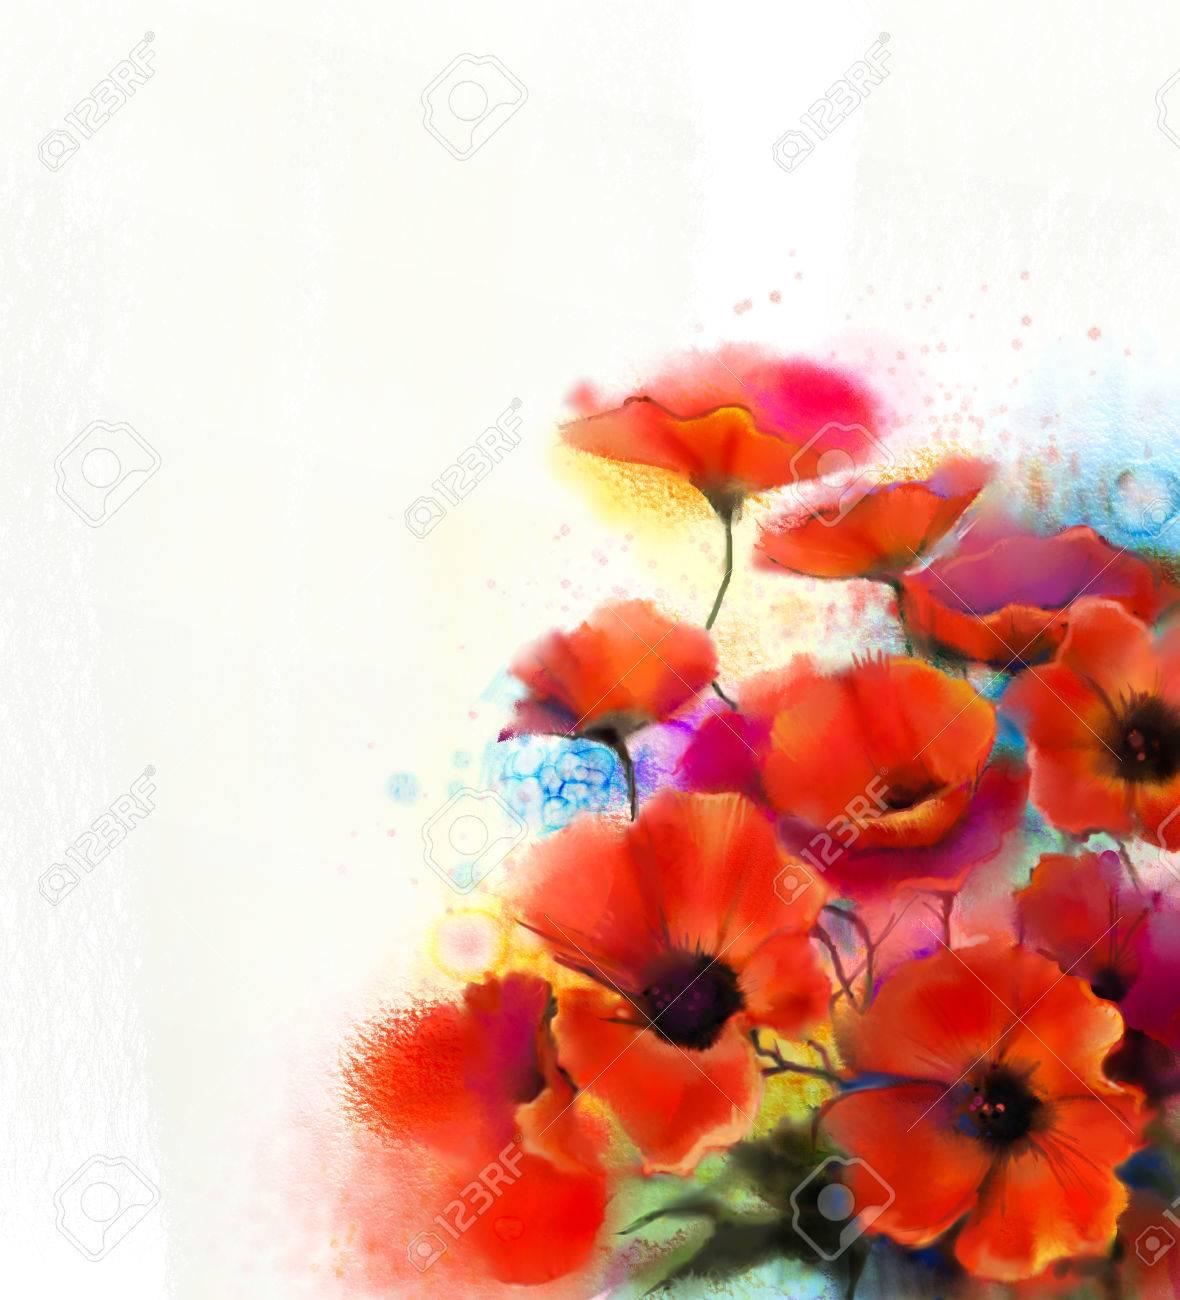 Aquarell Rote Mohnblumenmalerei Hand Malen Mohnblumen Blumen In